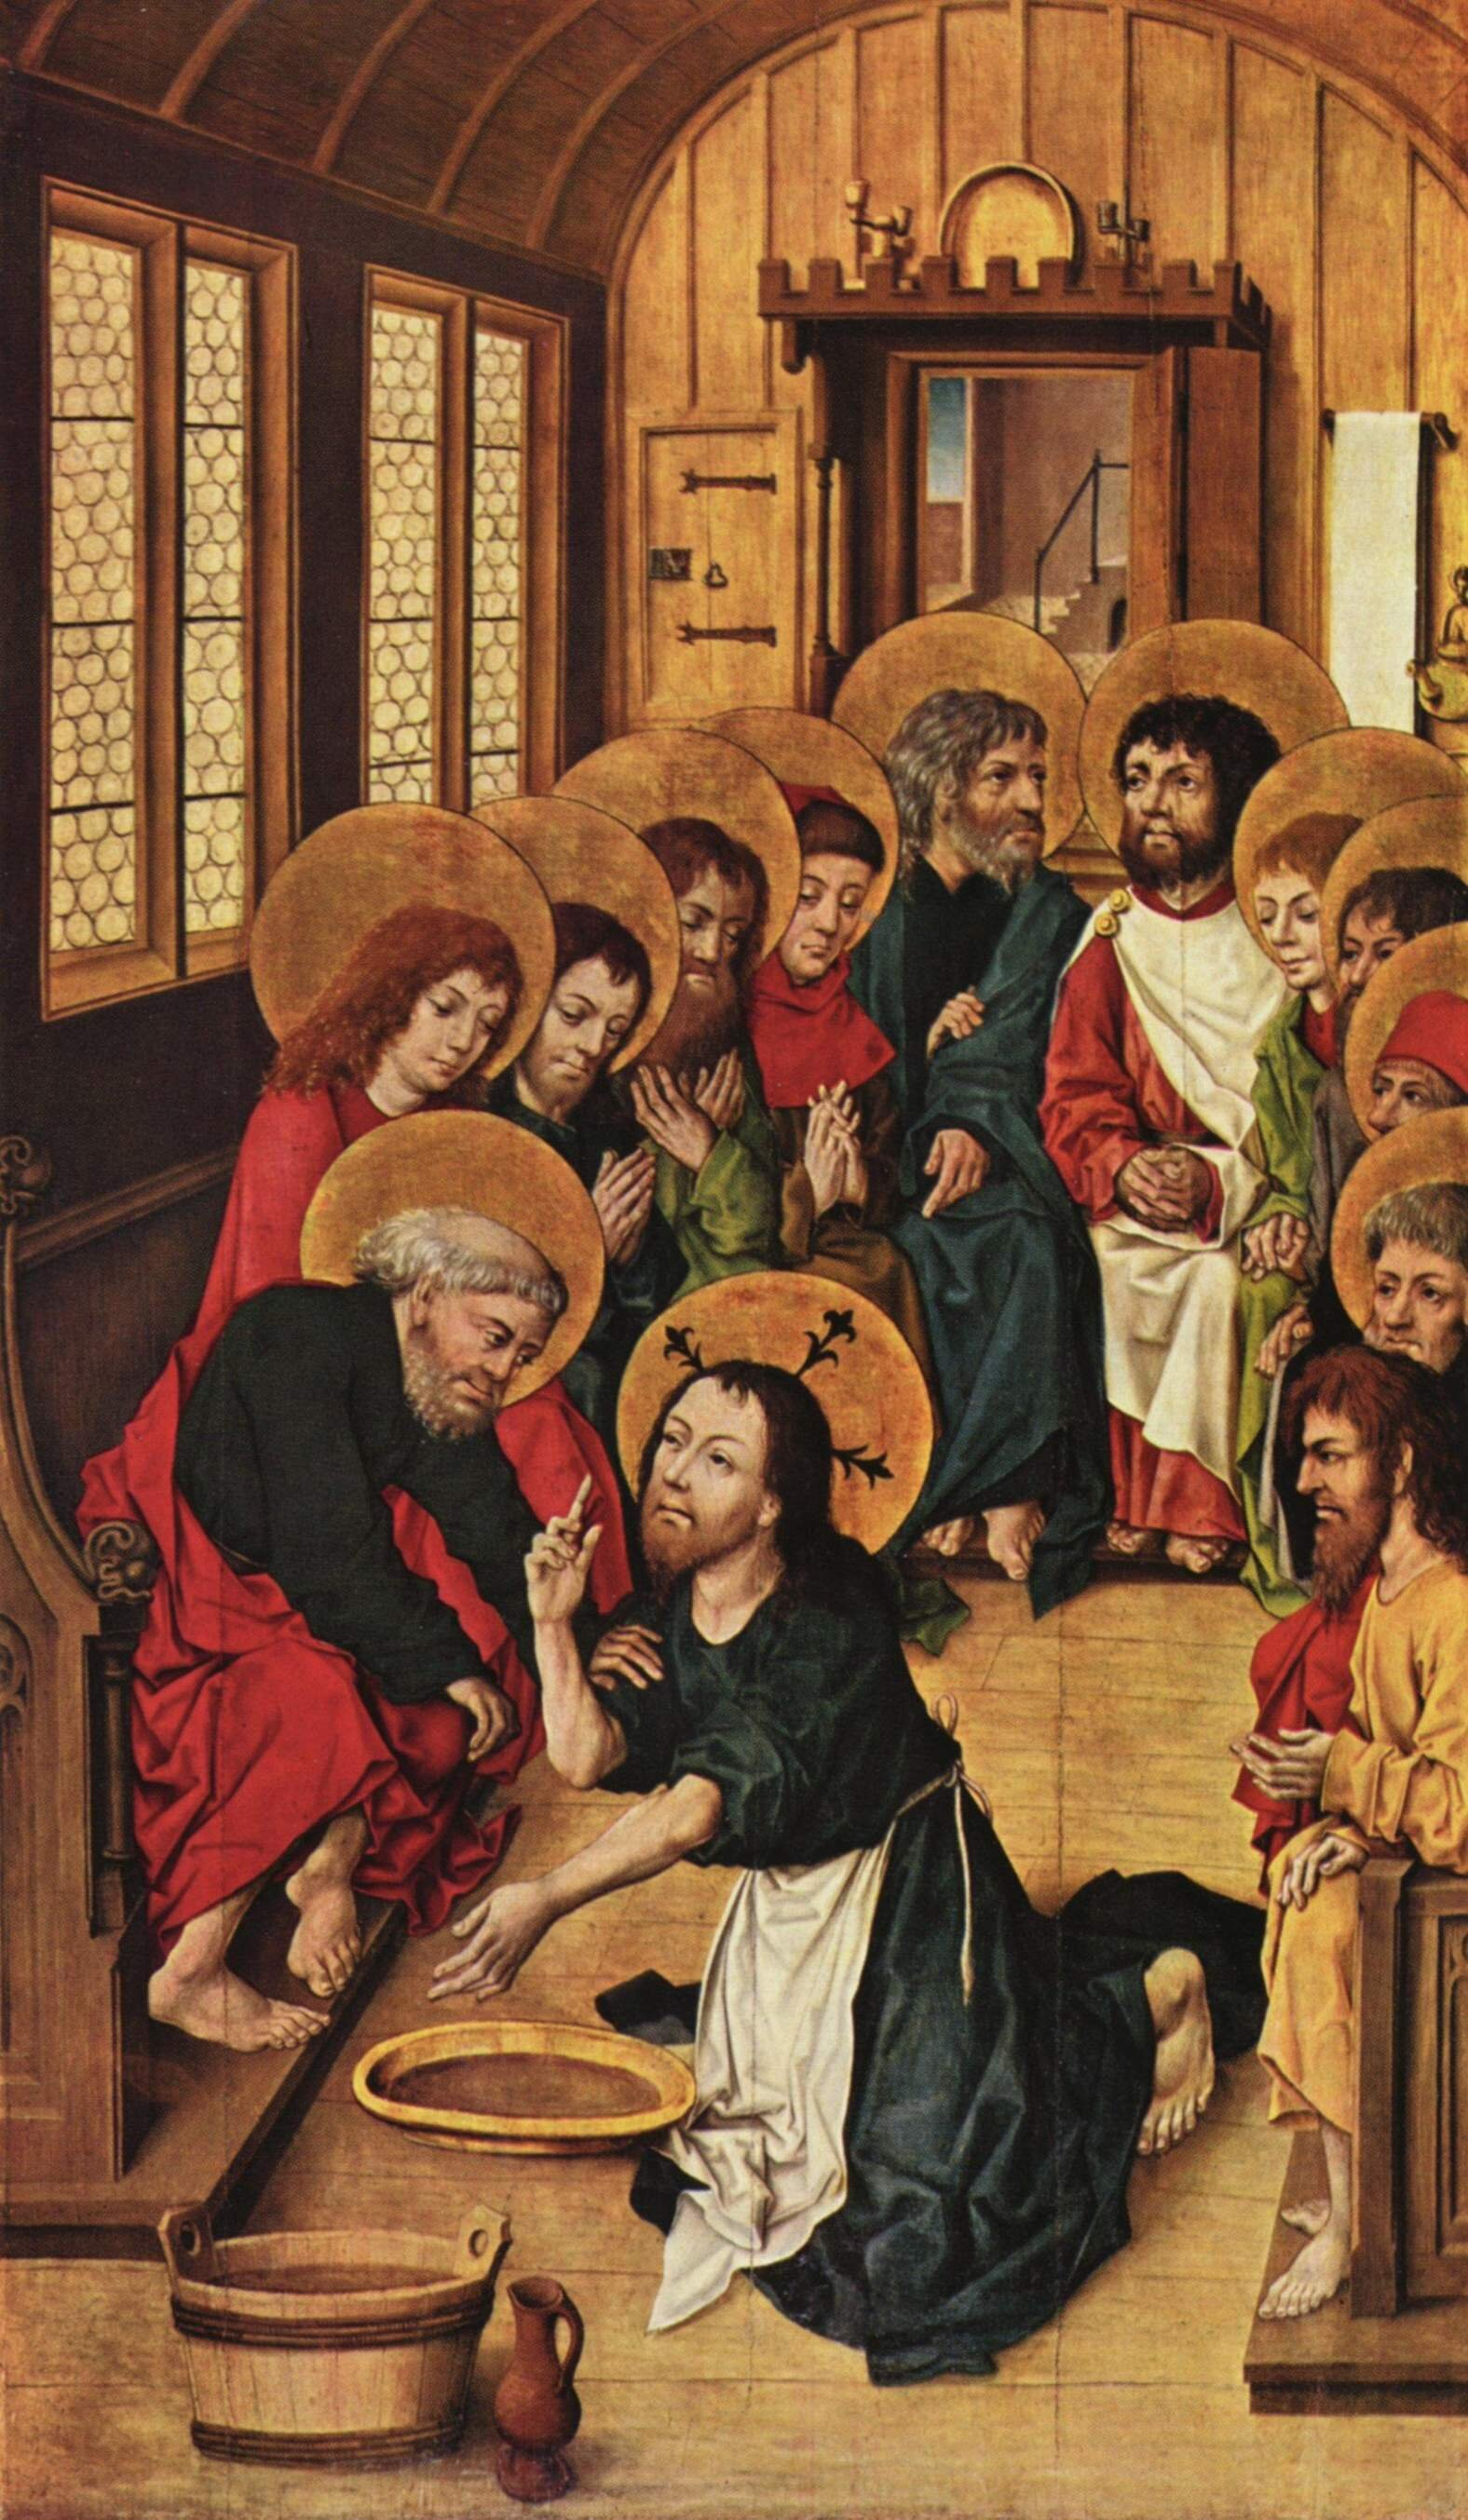 Christ Washing the Feet of the Apostles , Meister des Hausbuches, 1475